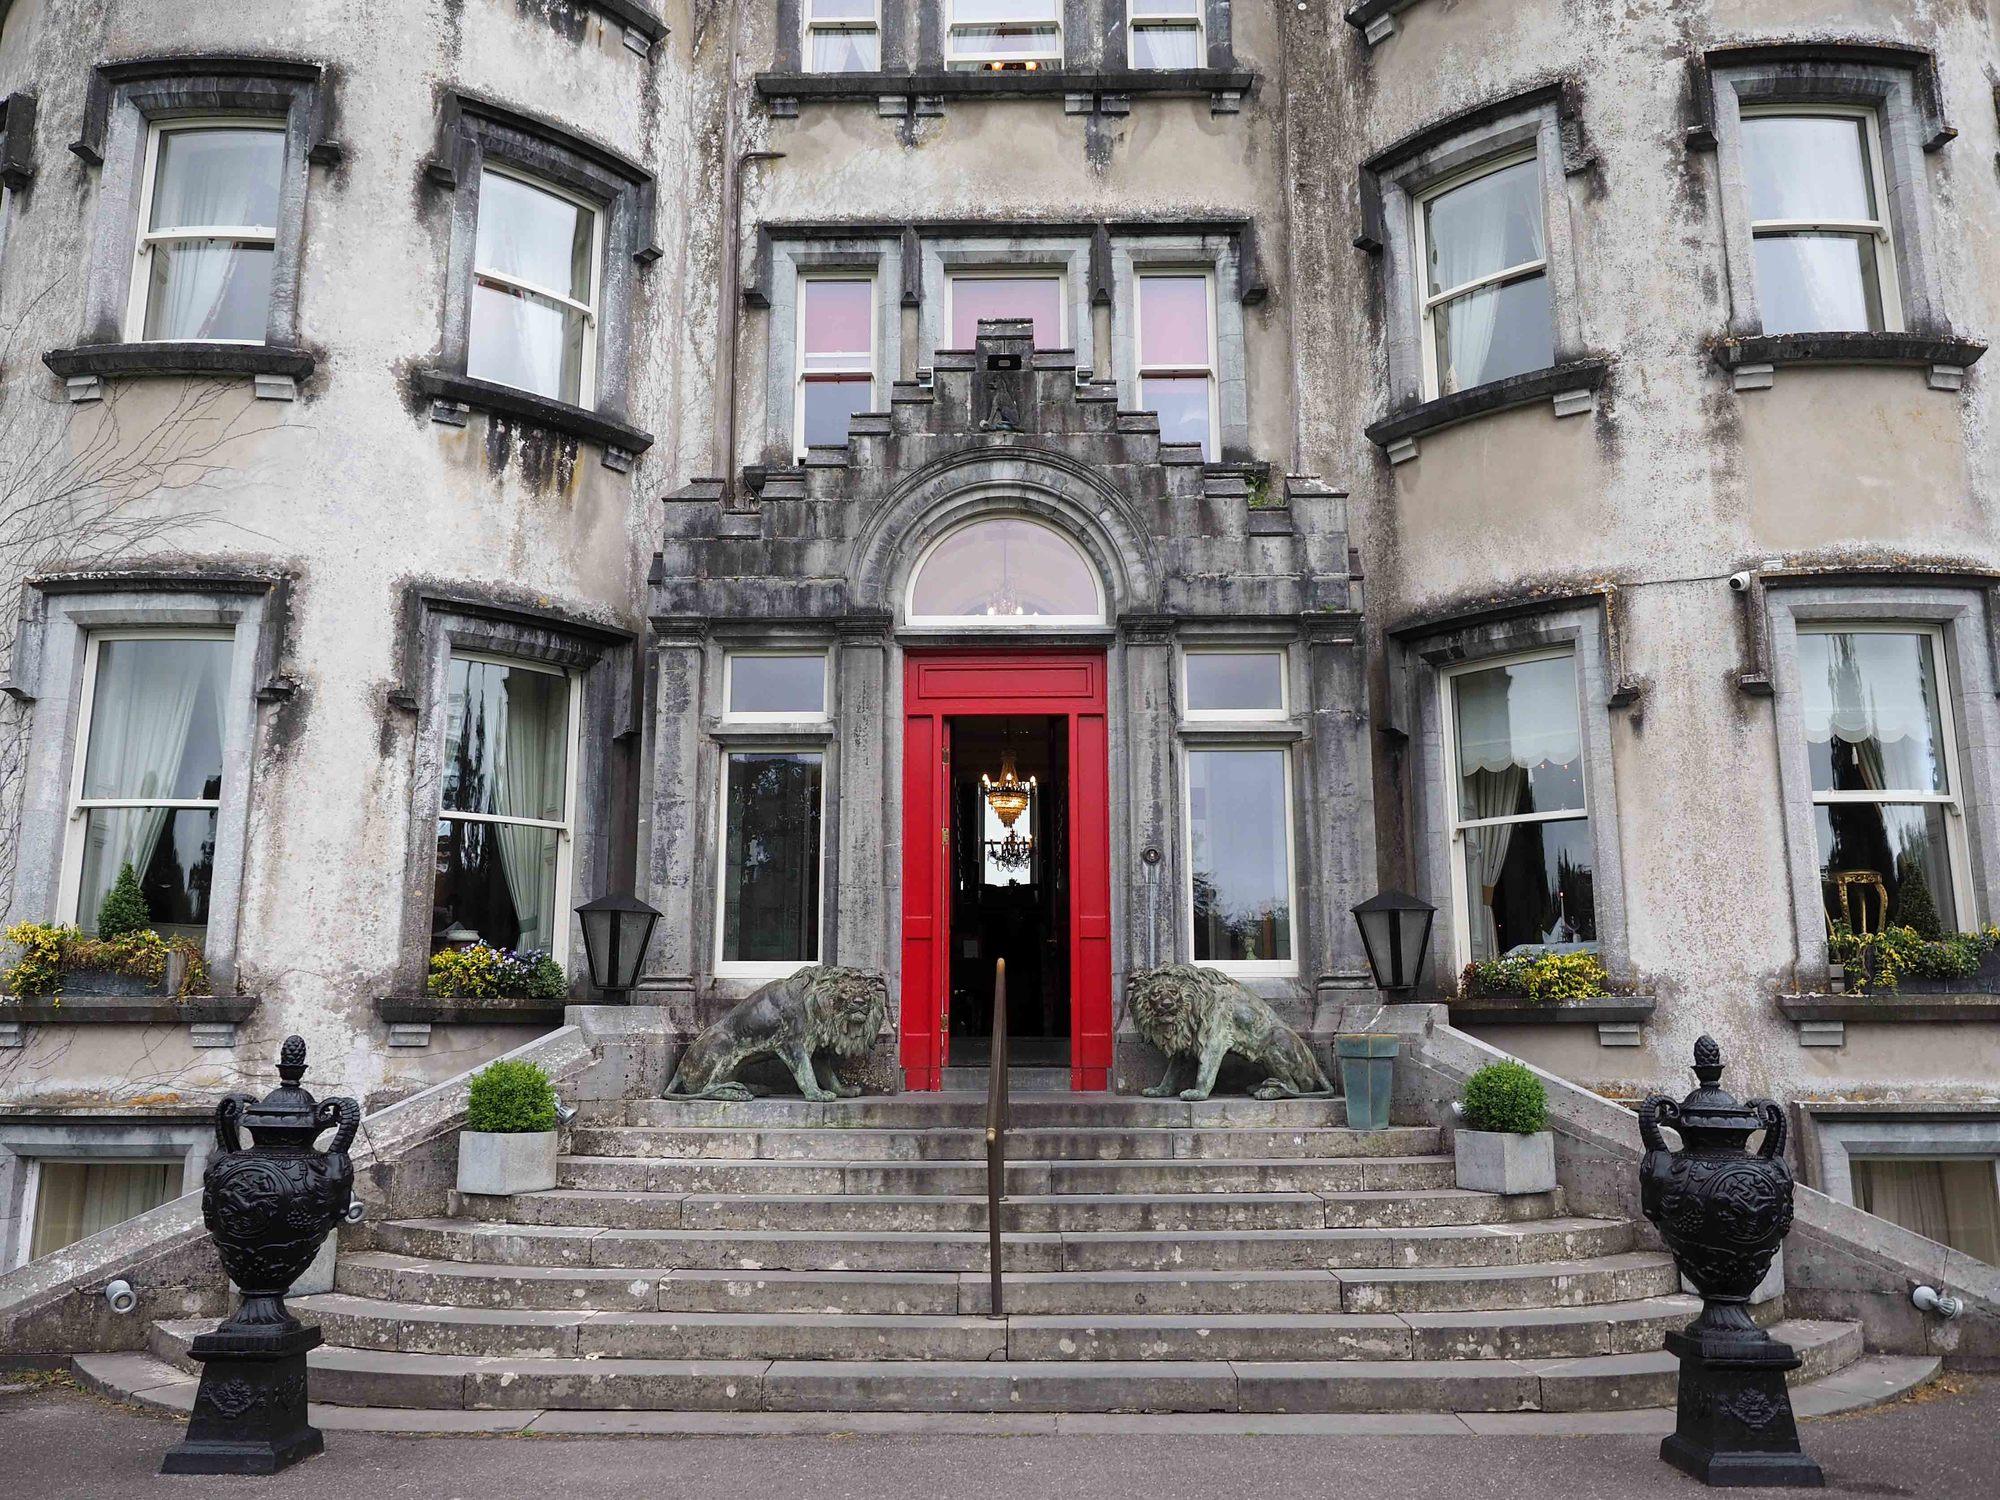 Ballyseede Castle Hotel in Ireland